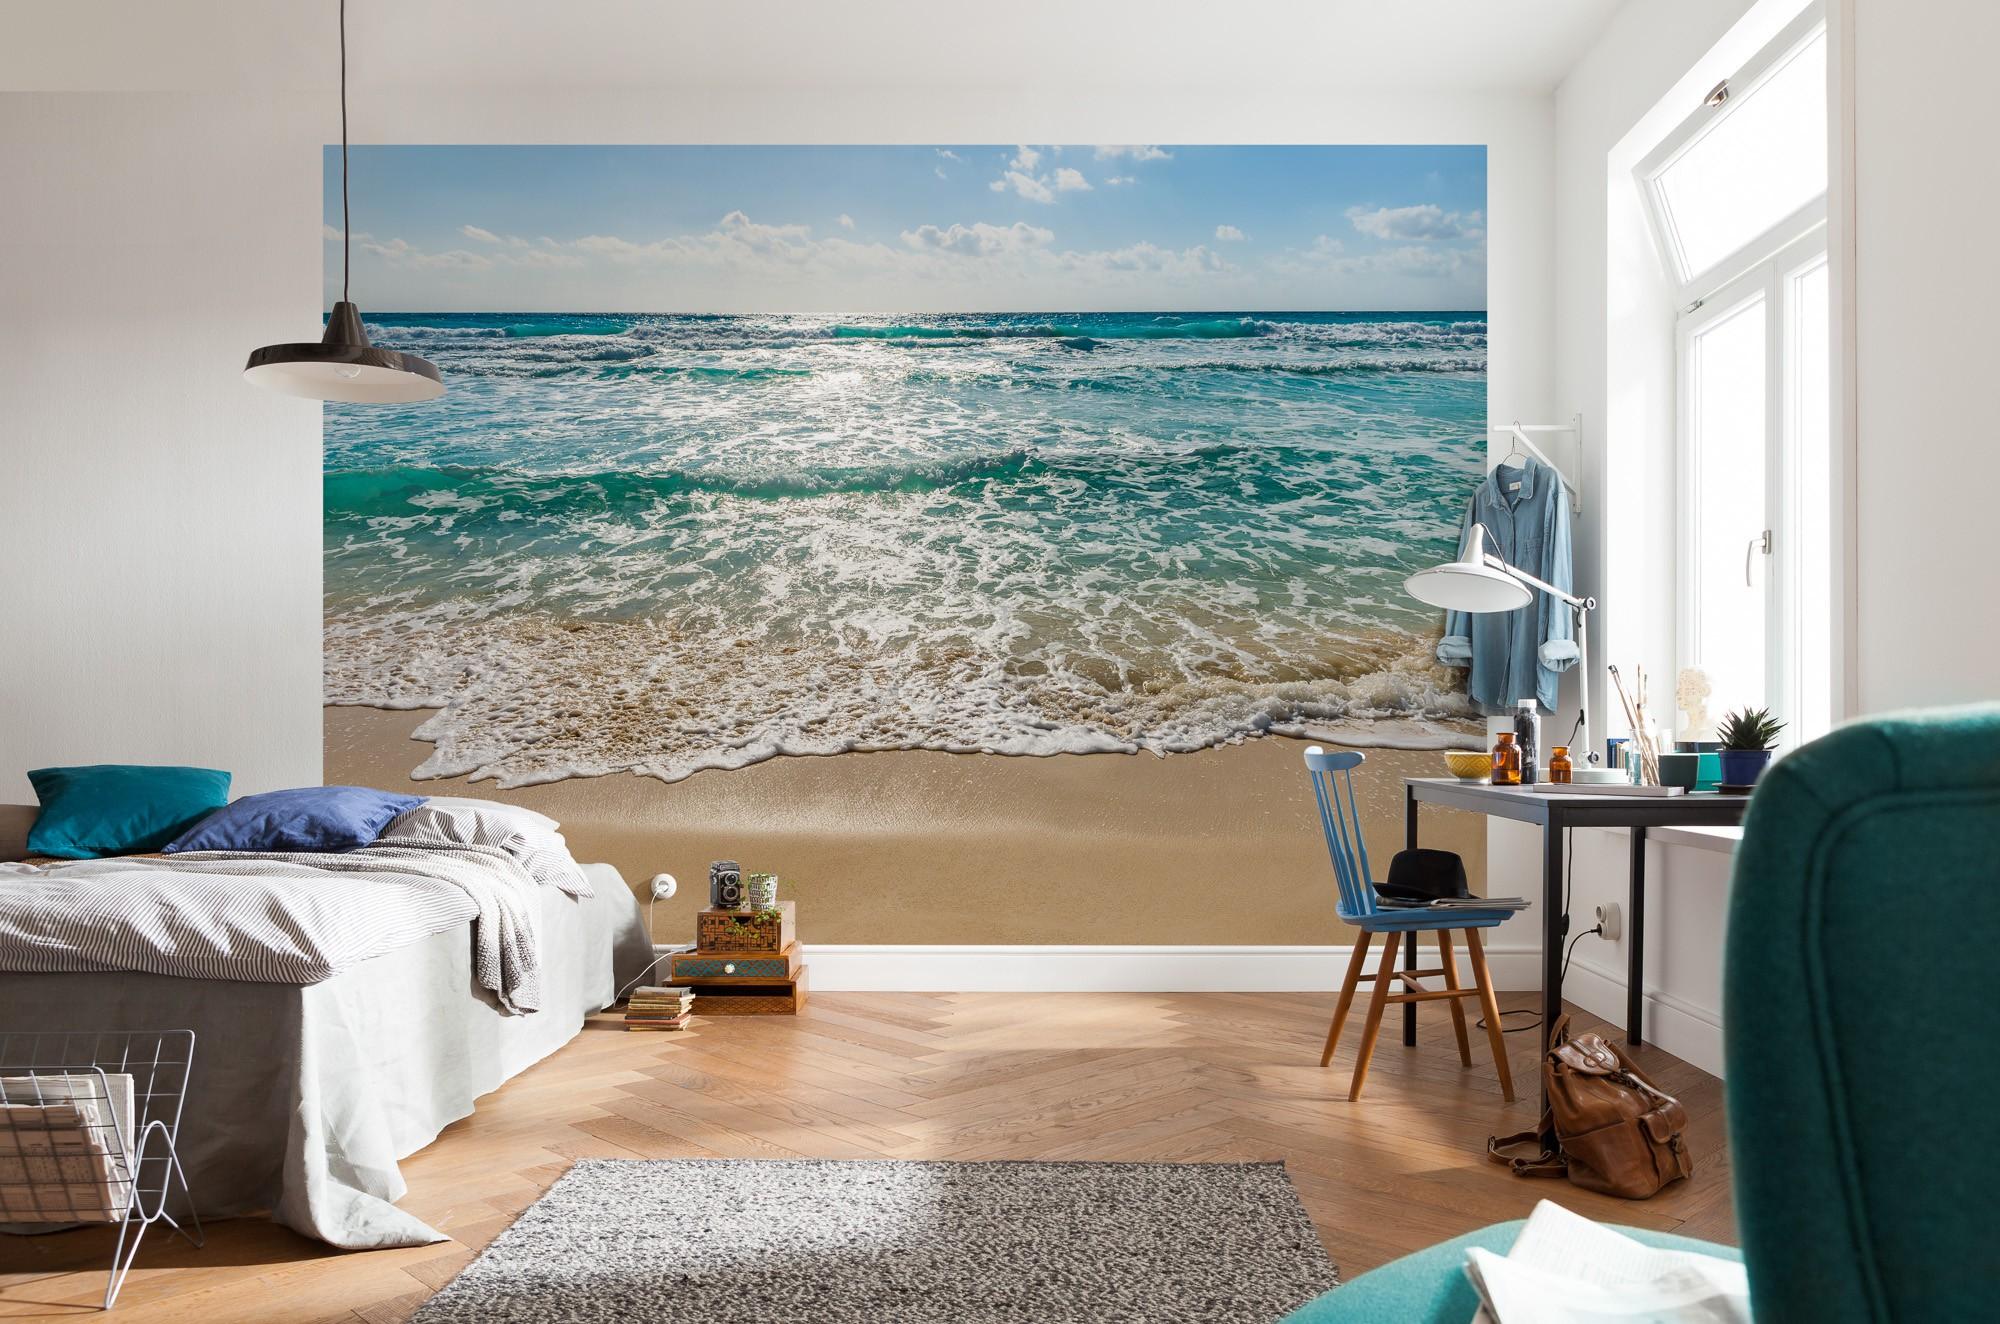 Фотообои море в интерьере фото